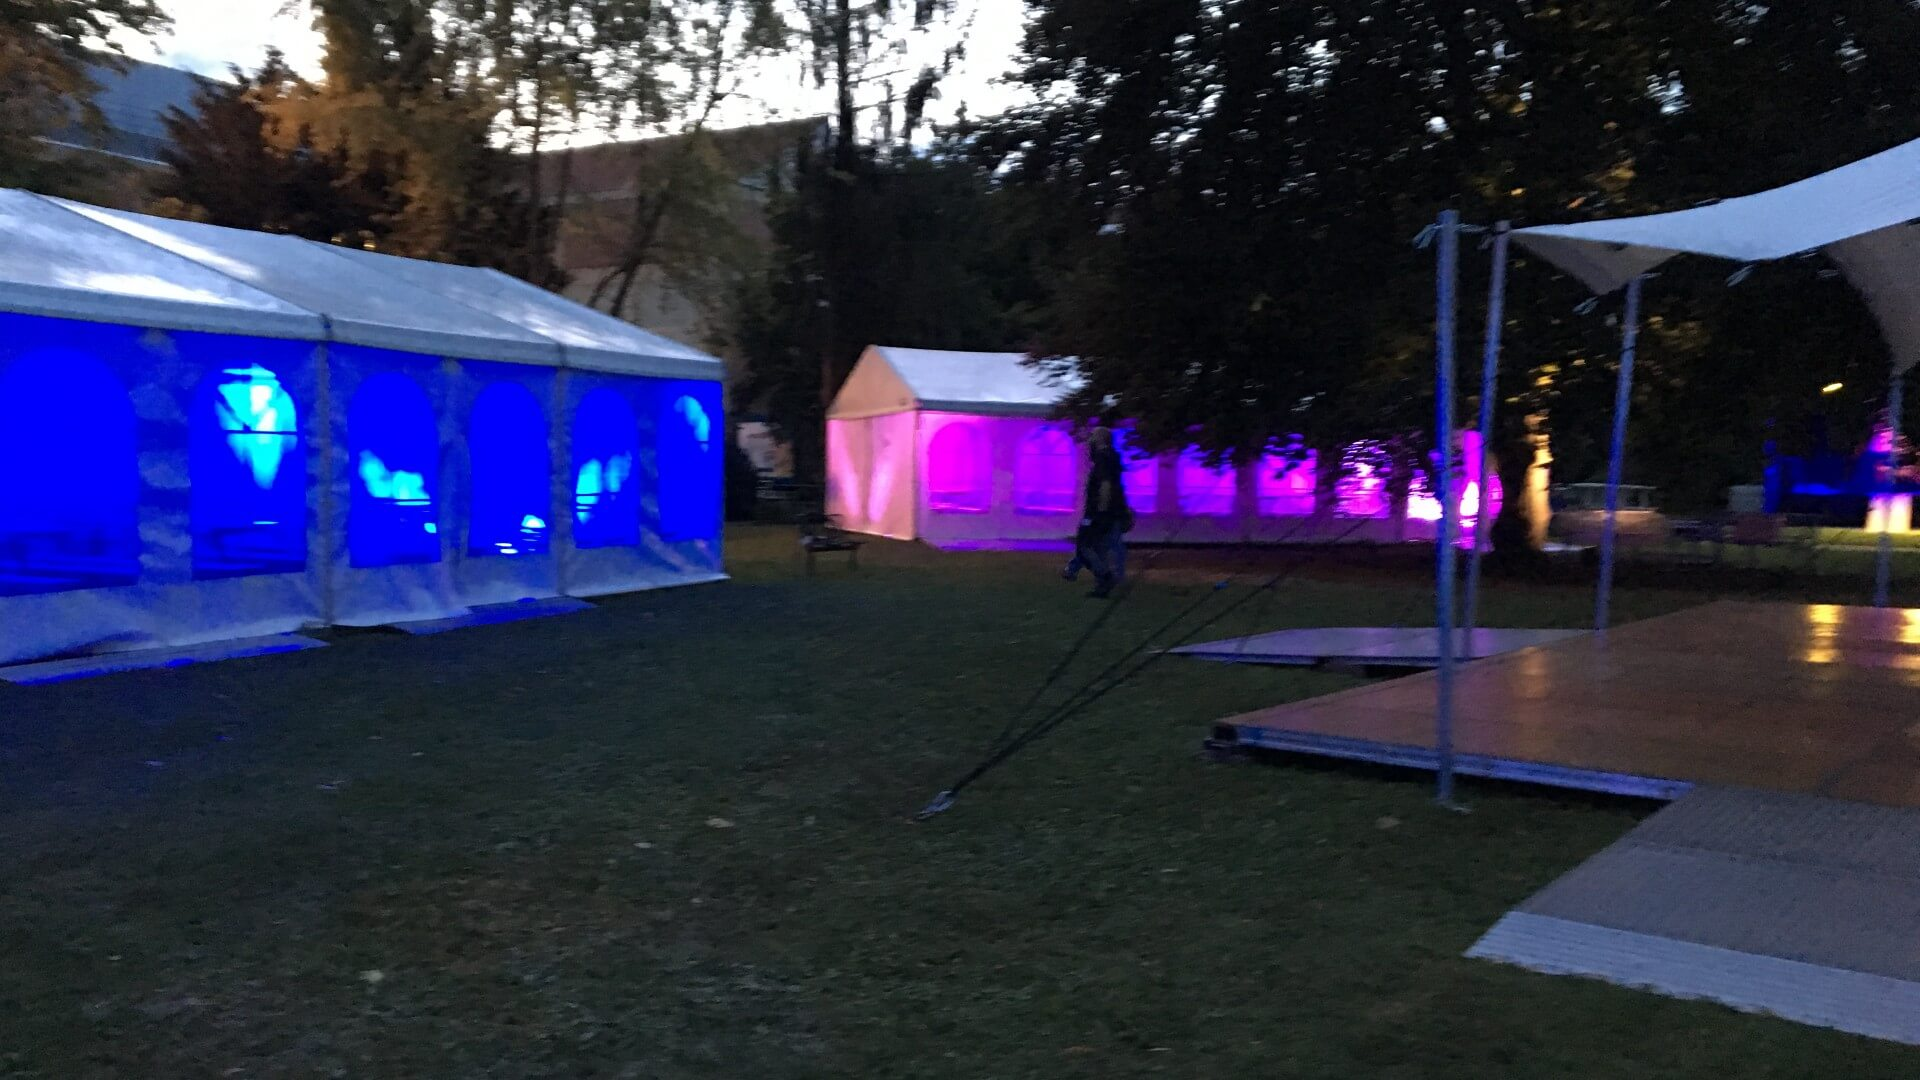 Veranstaltung Zelte